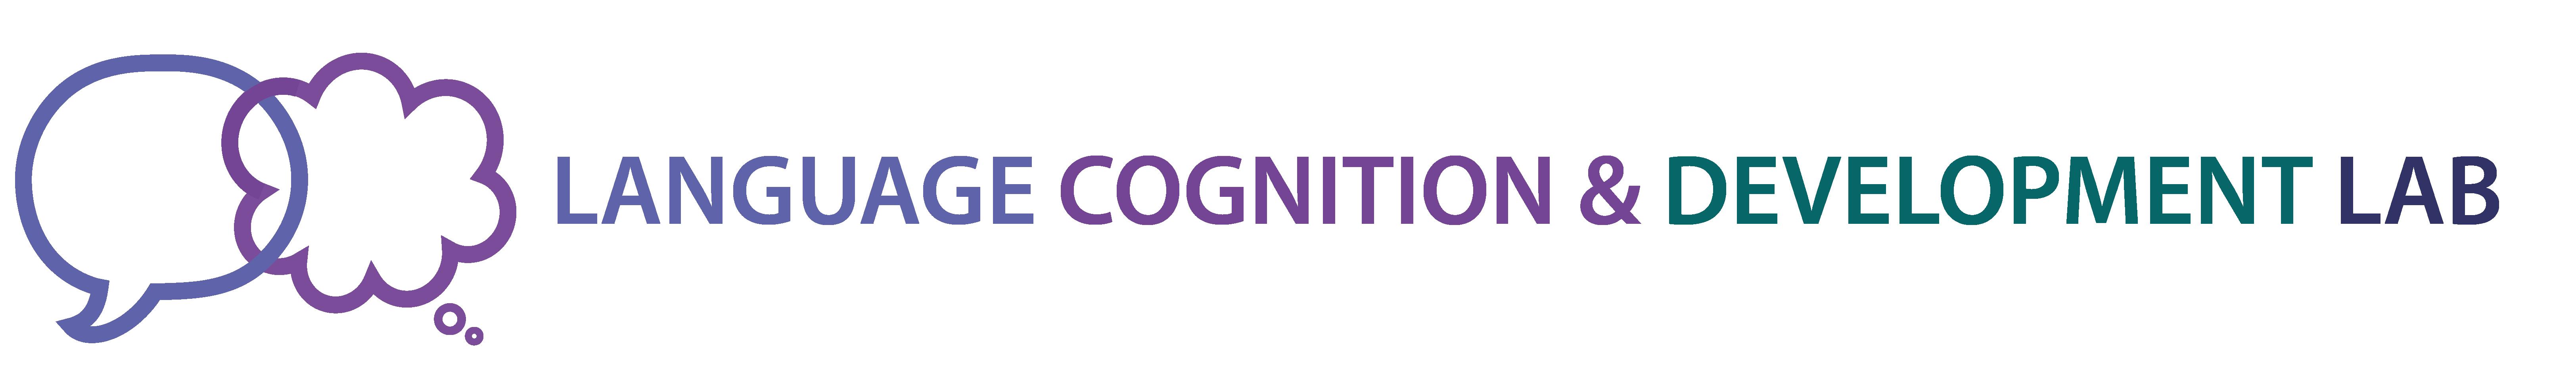 Language, Cognition and Development Lab